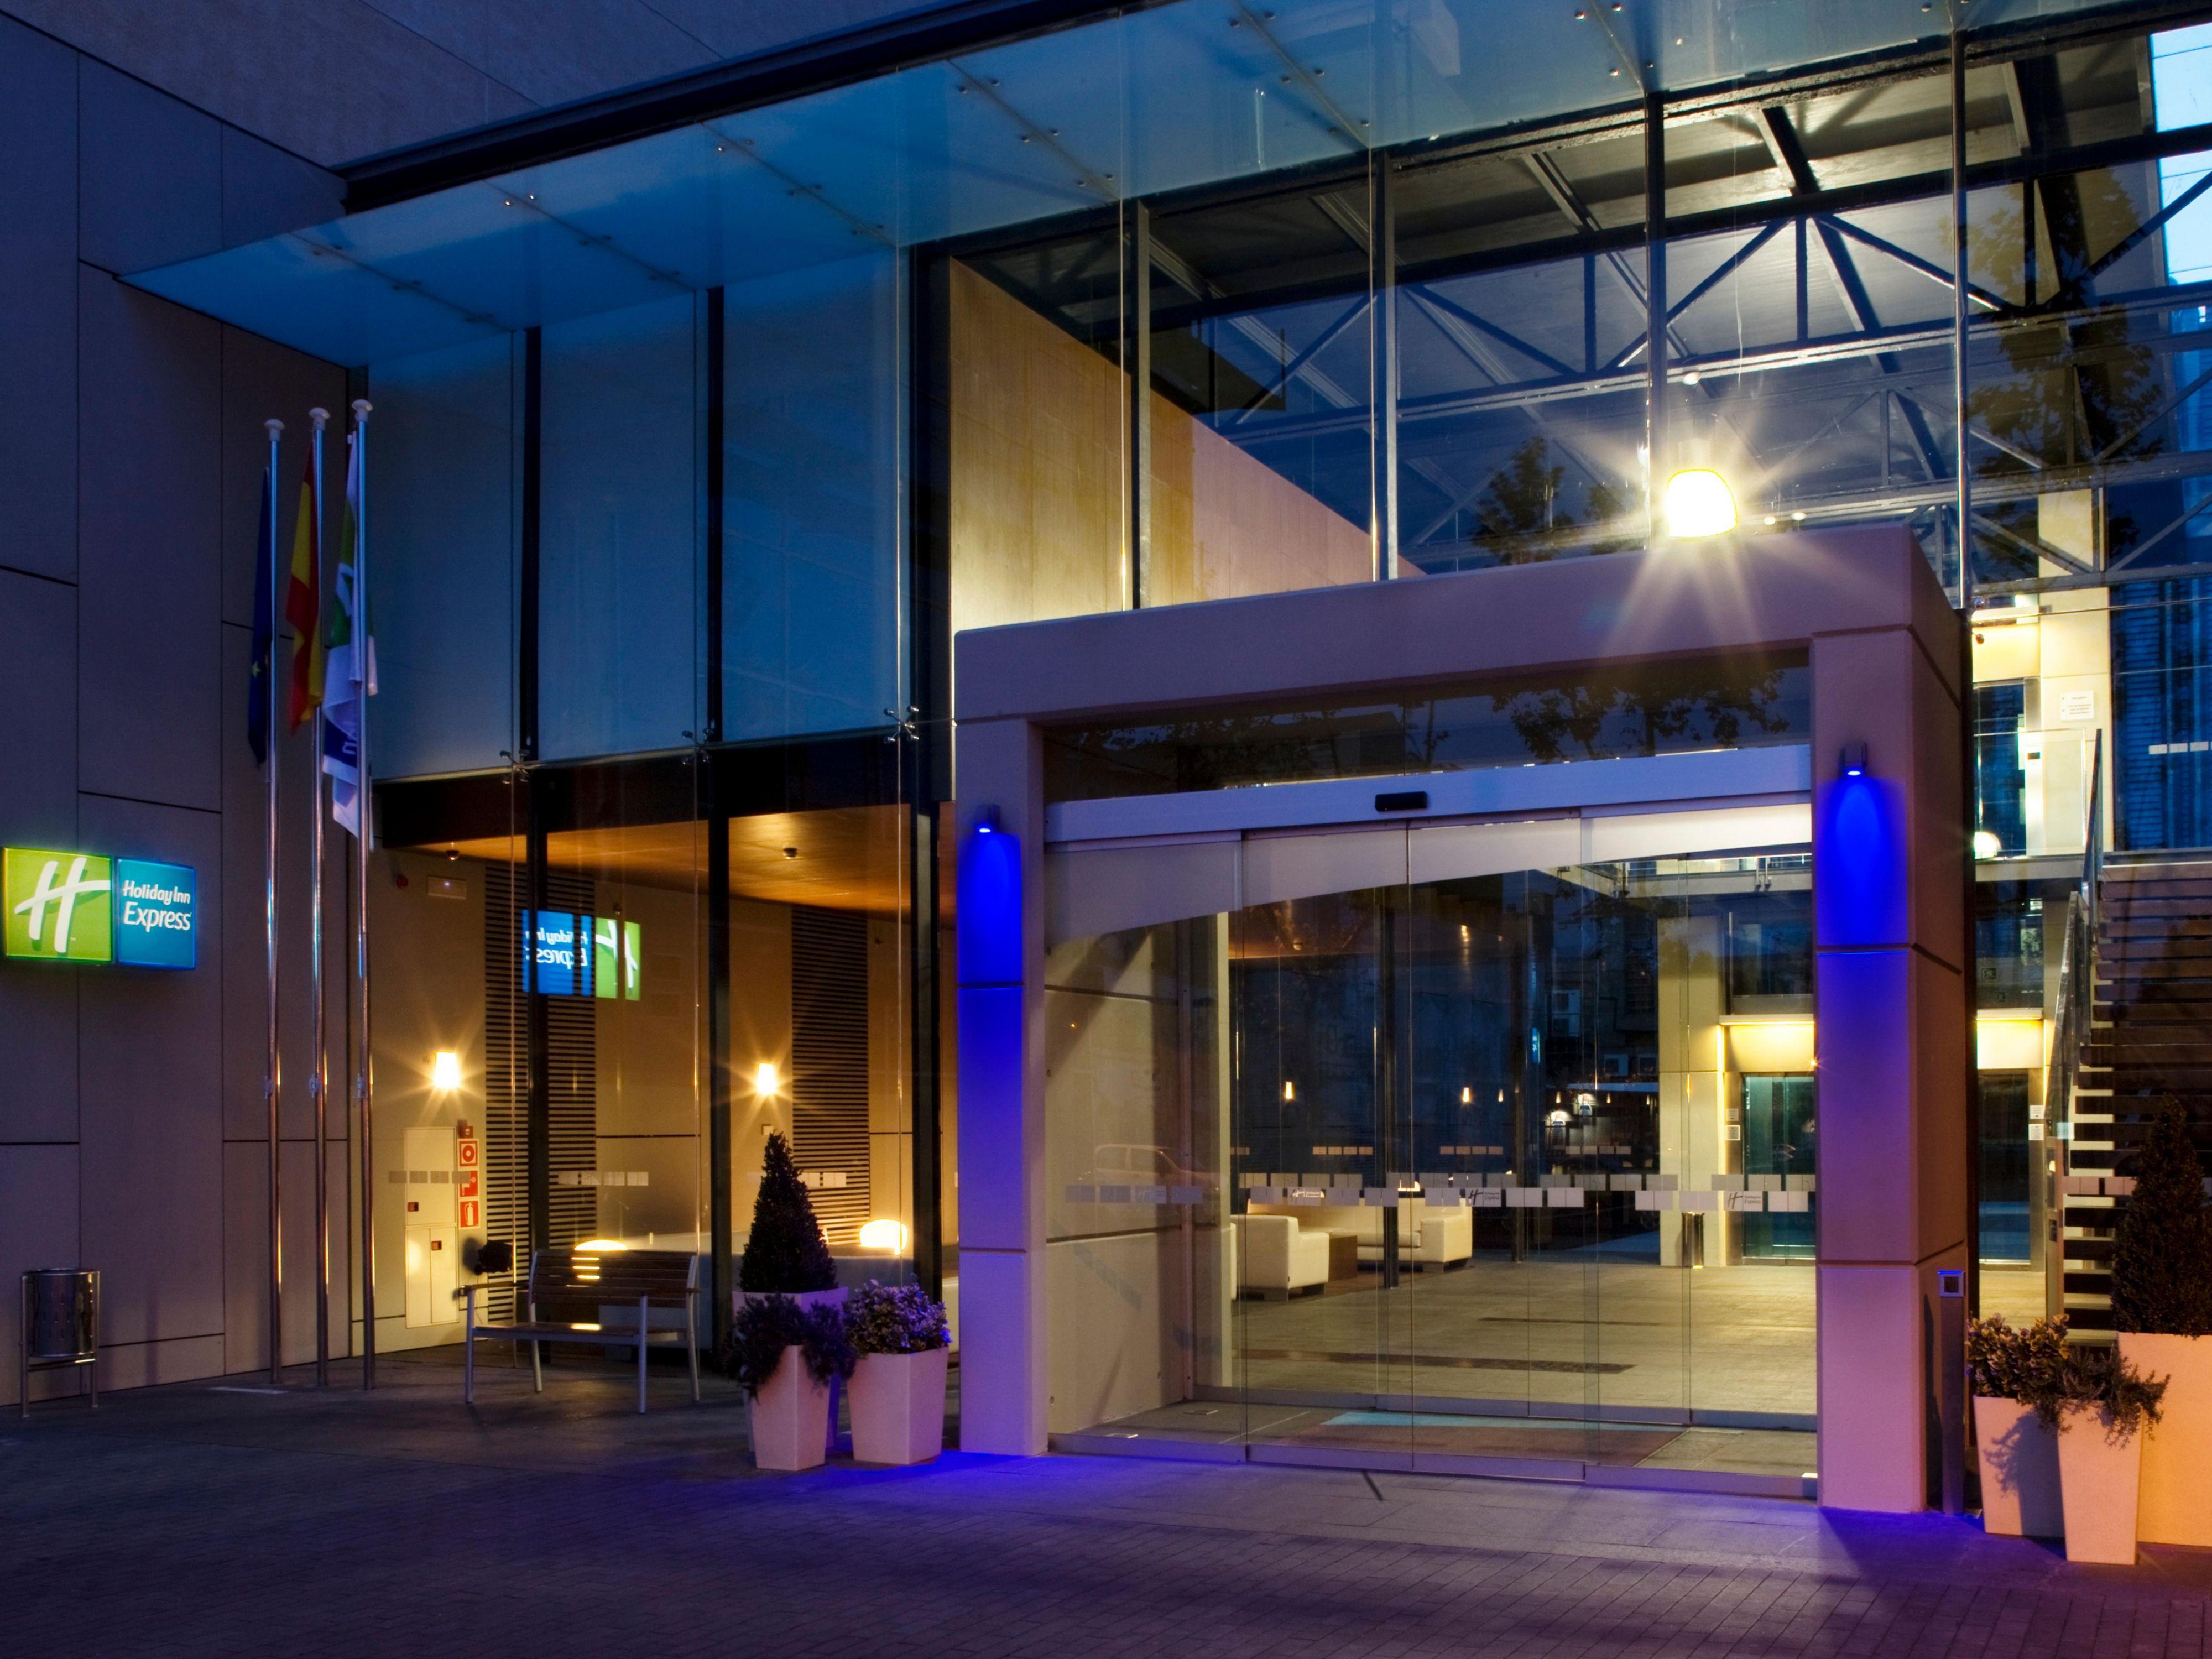 Hotel Holiday Inn Express Barcelona City